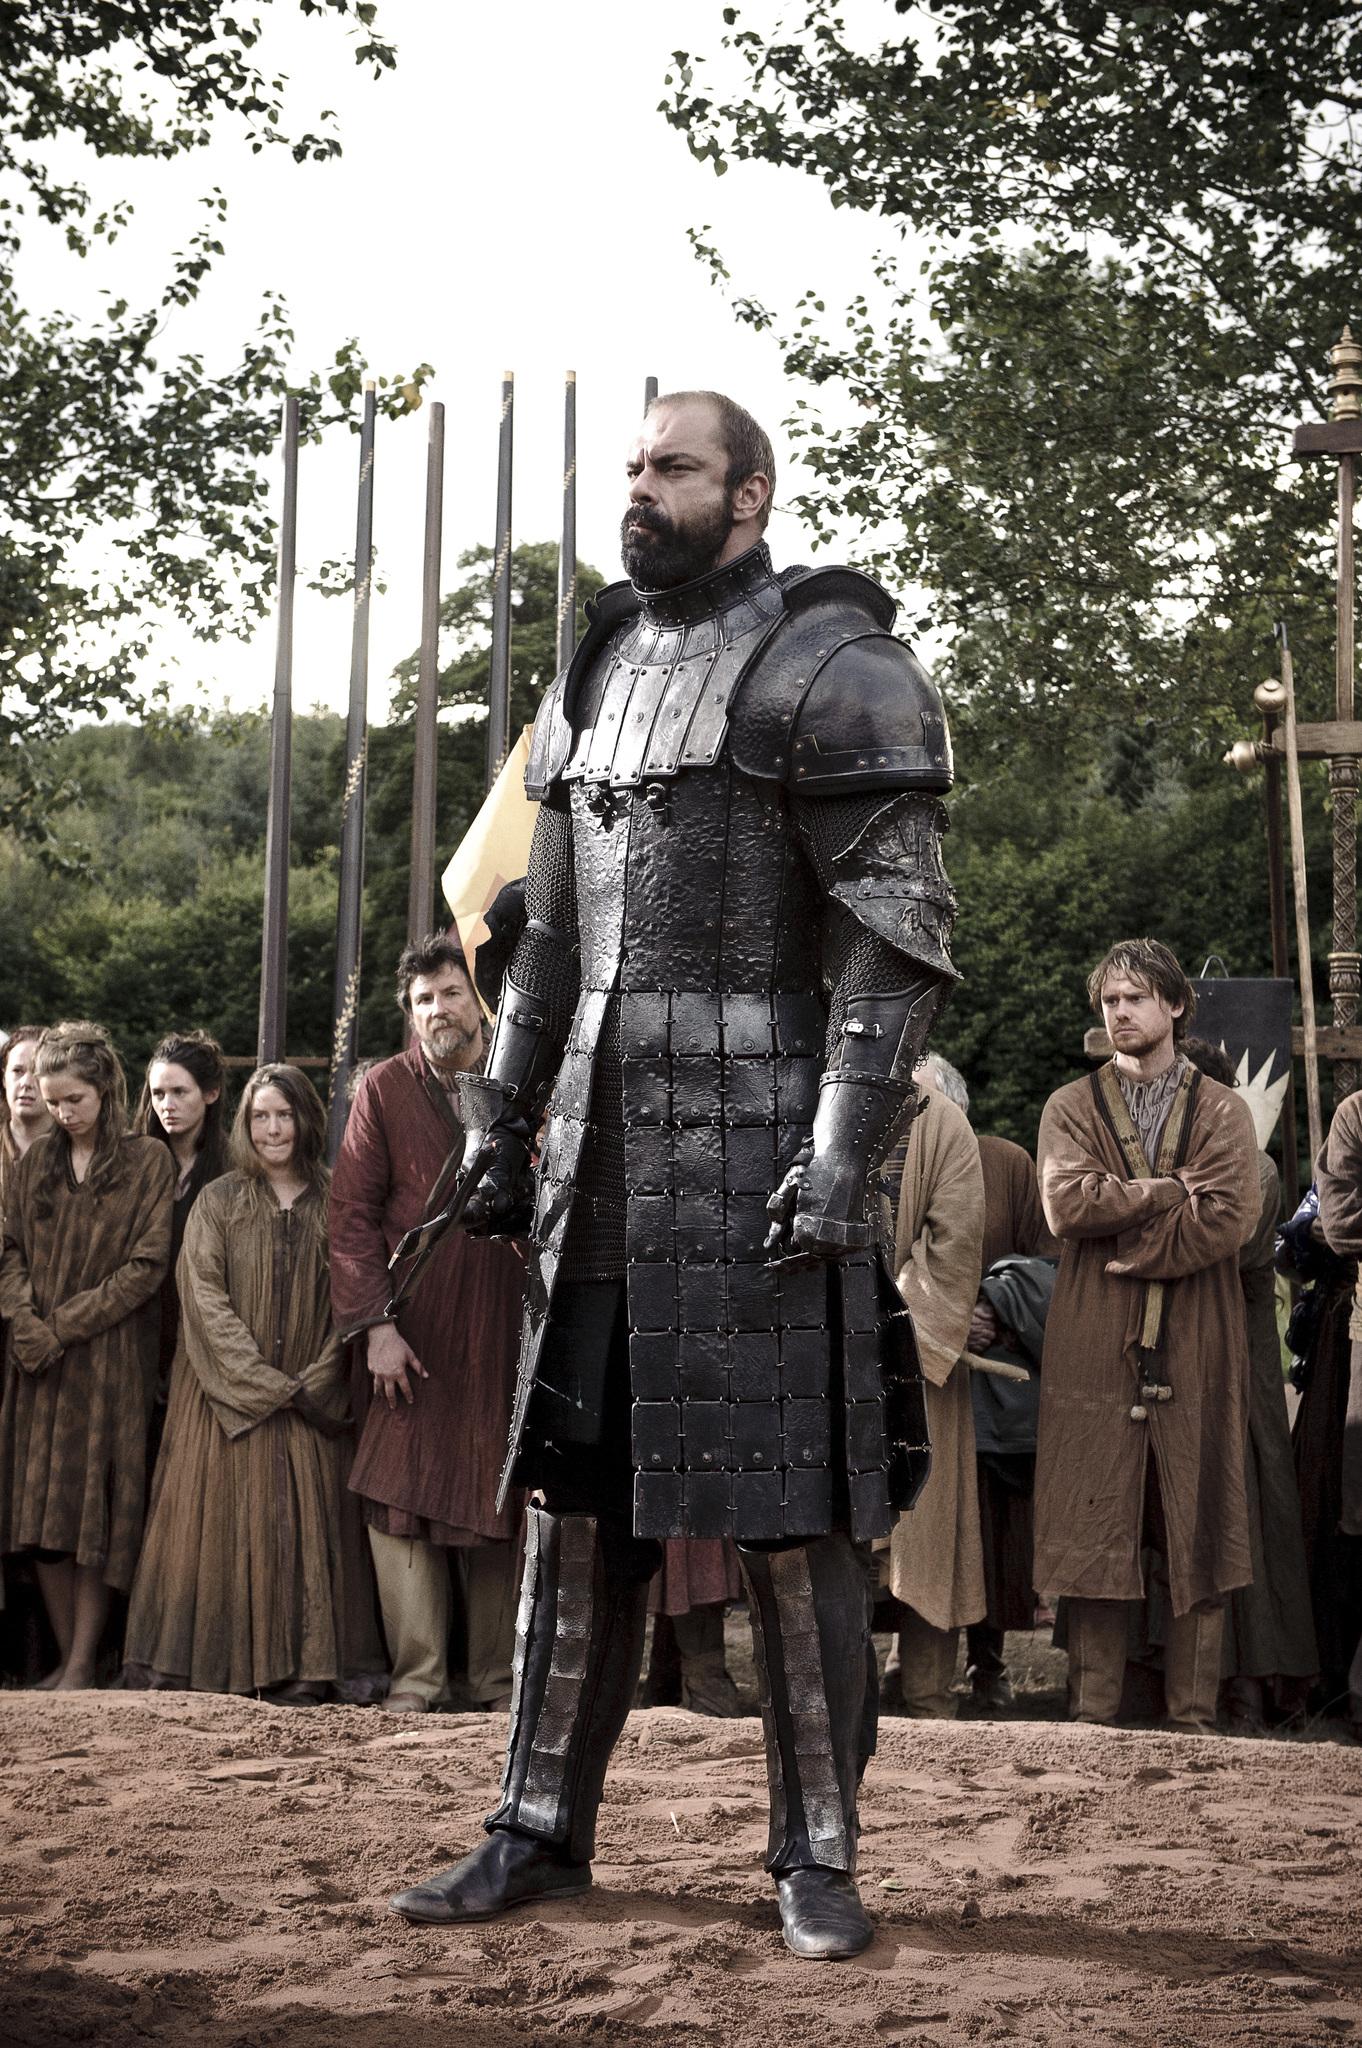 Conan Stevens in Game of Thrones (2011)